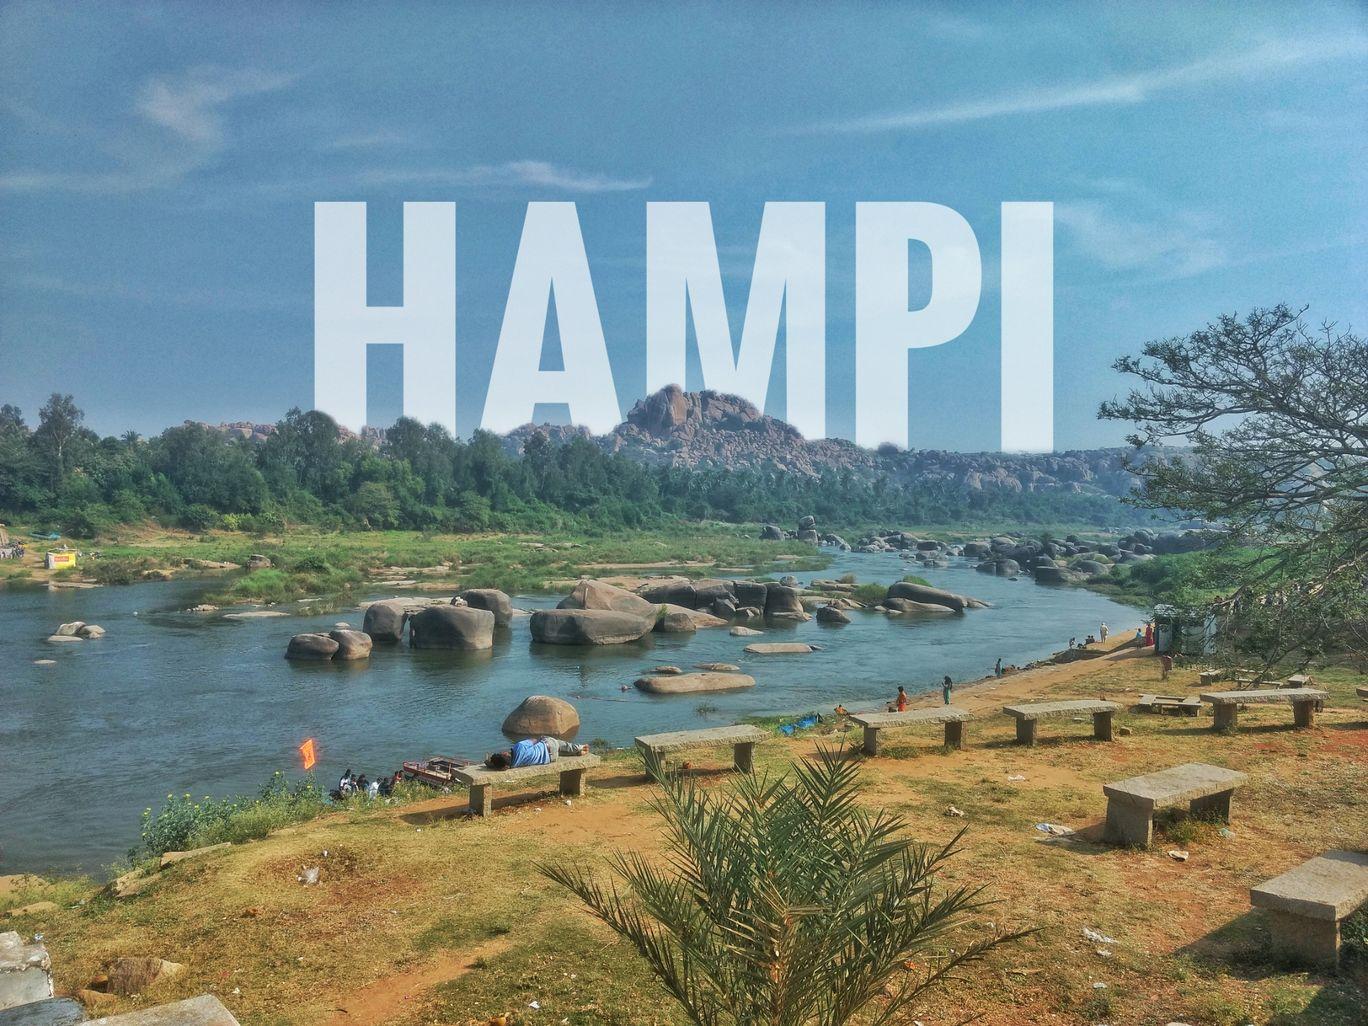 Photo of Hampi By Vaibhav Patil